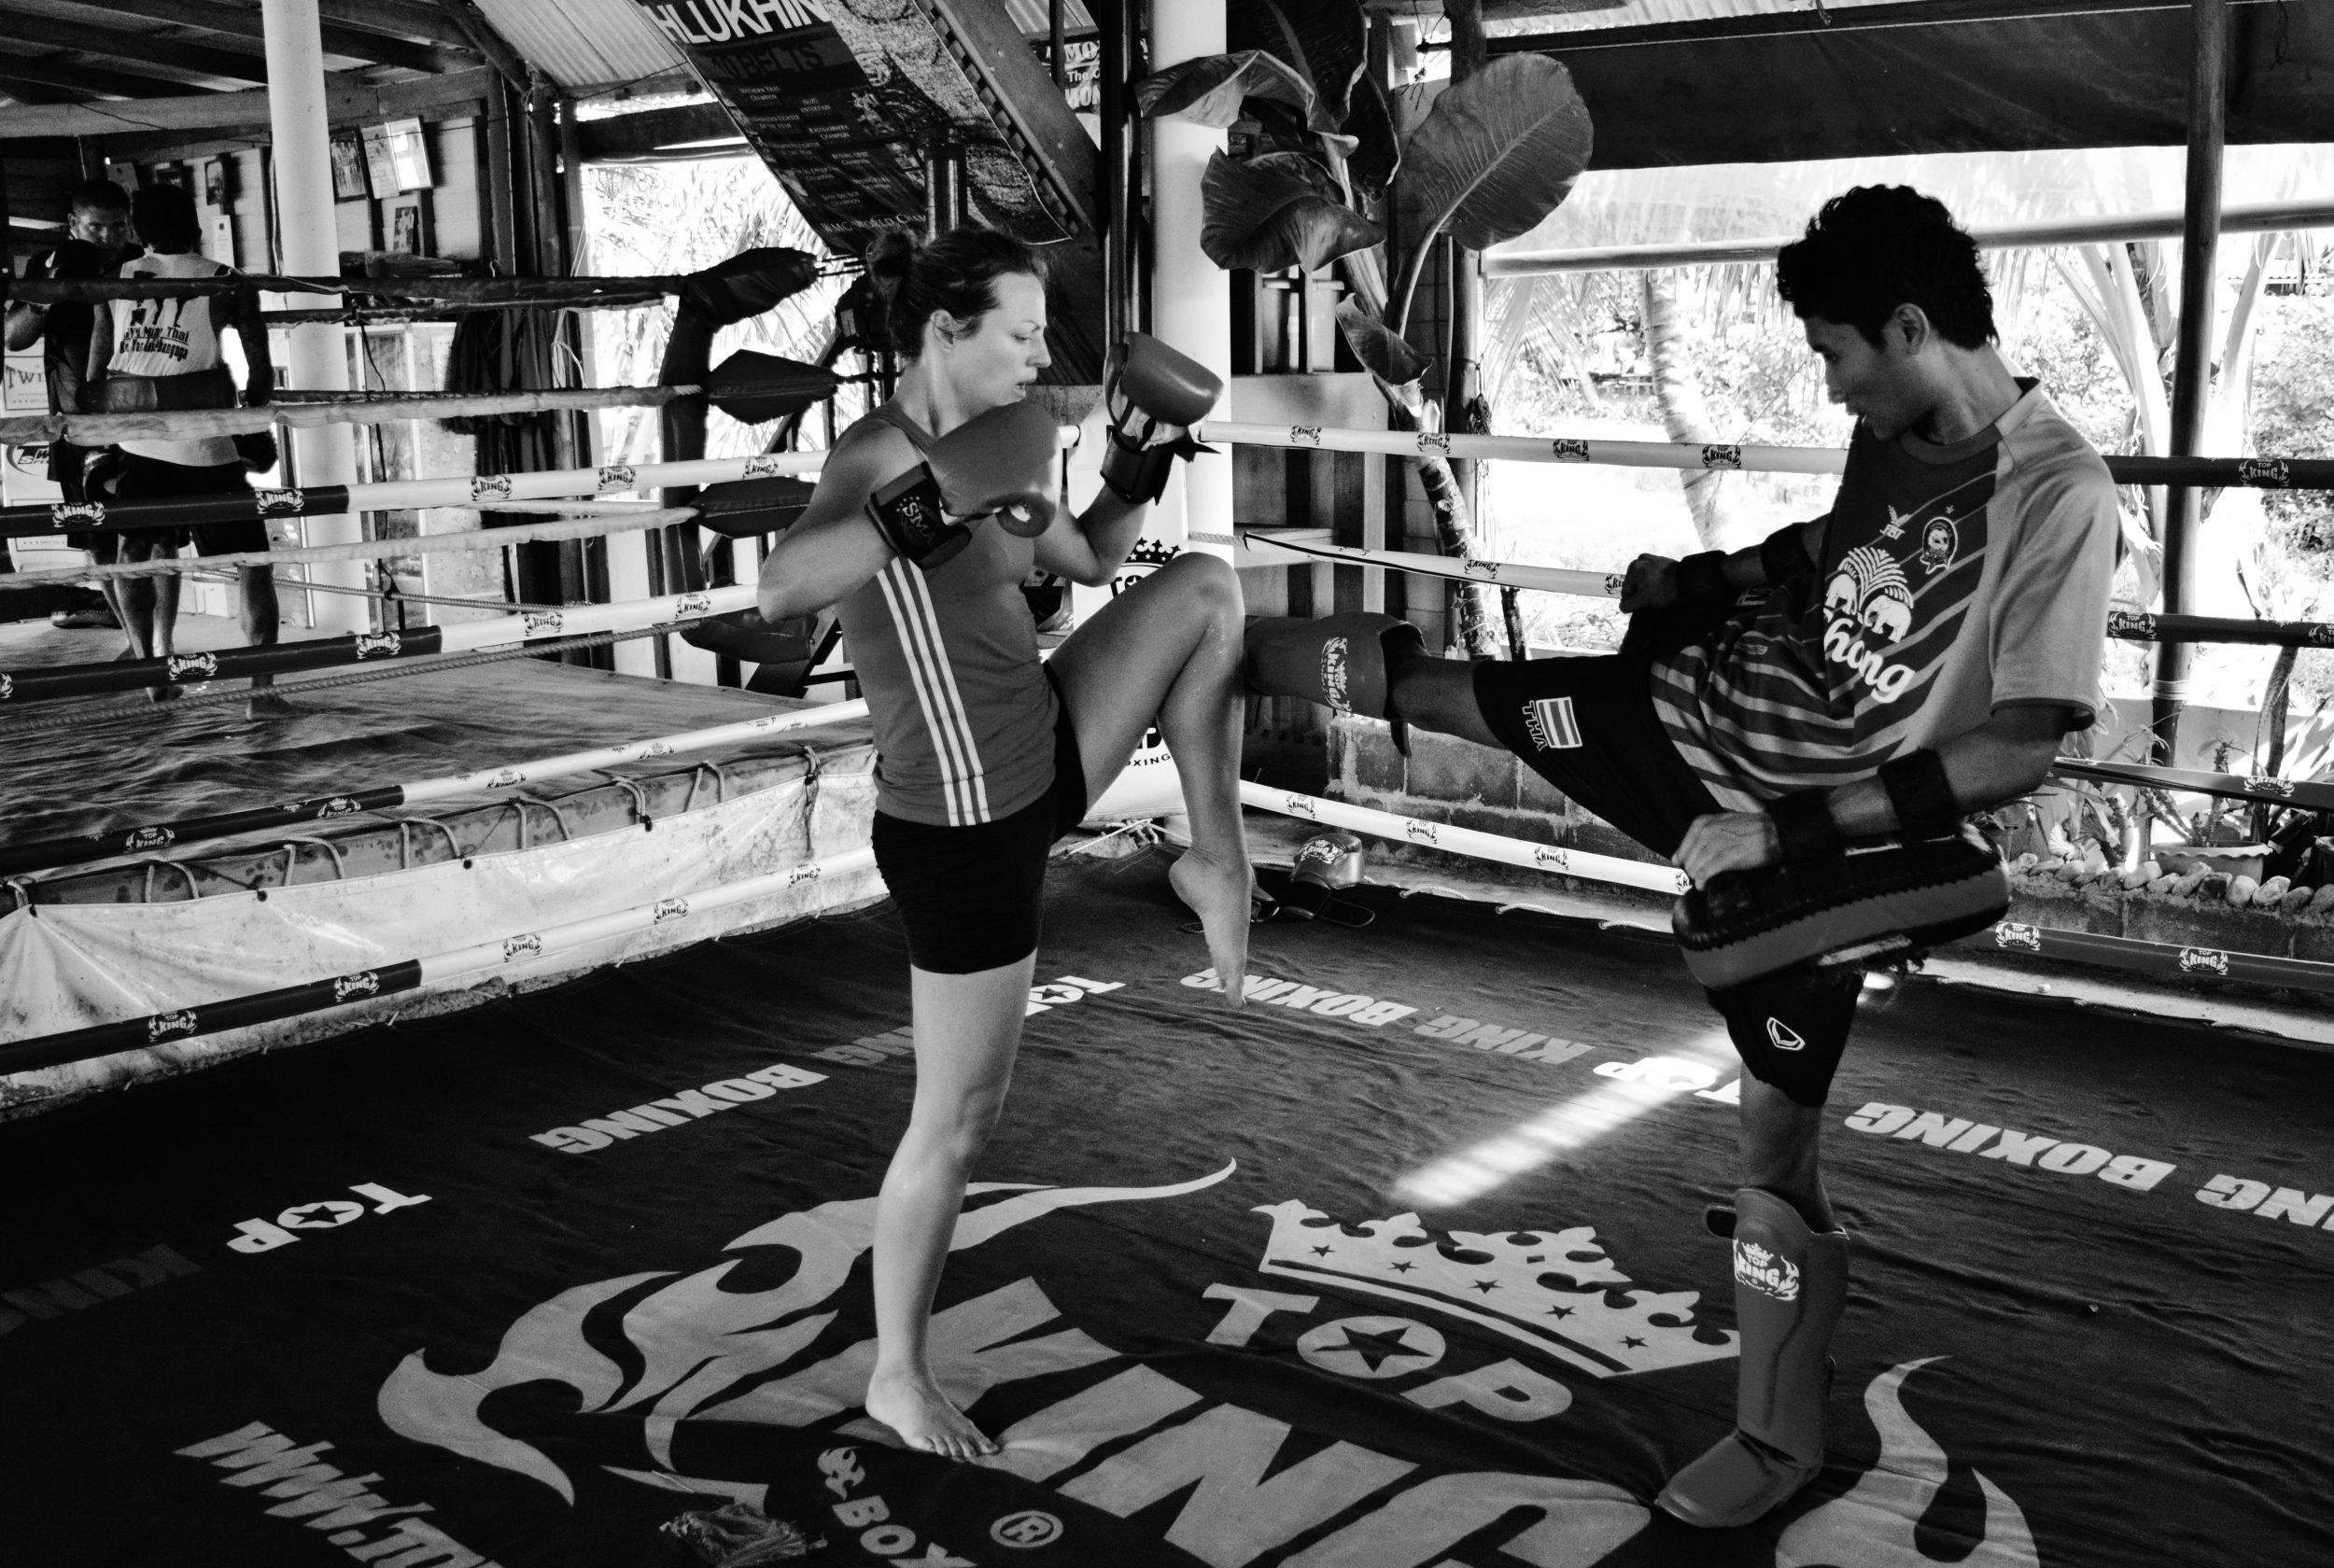 Nicole kickboxing in Muay Thai, Thailand